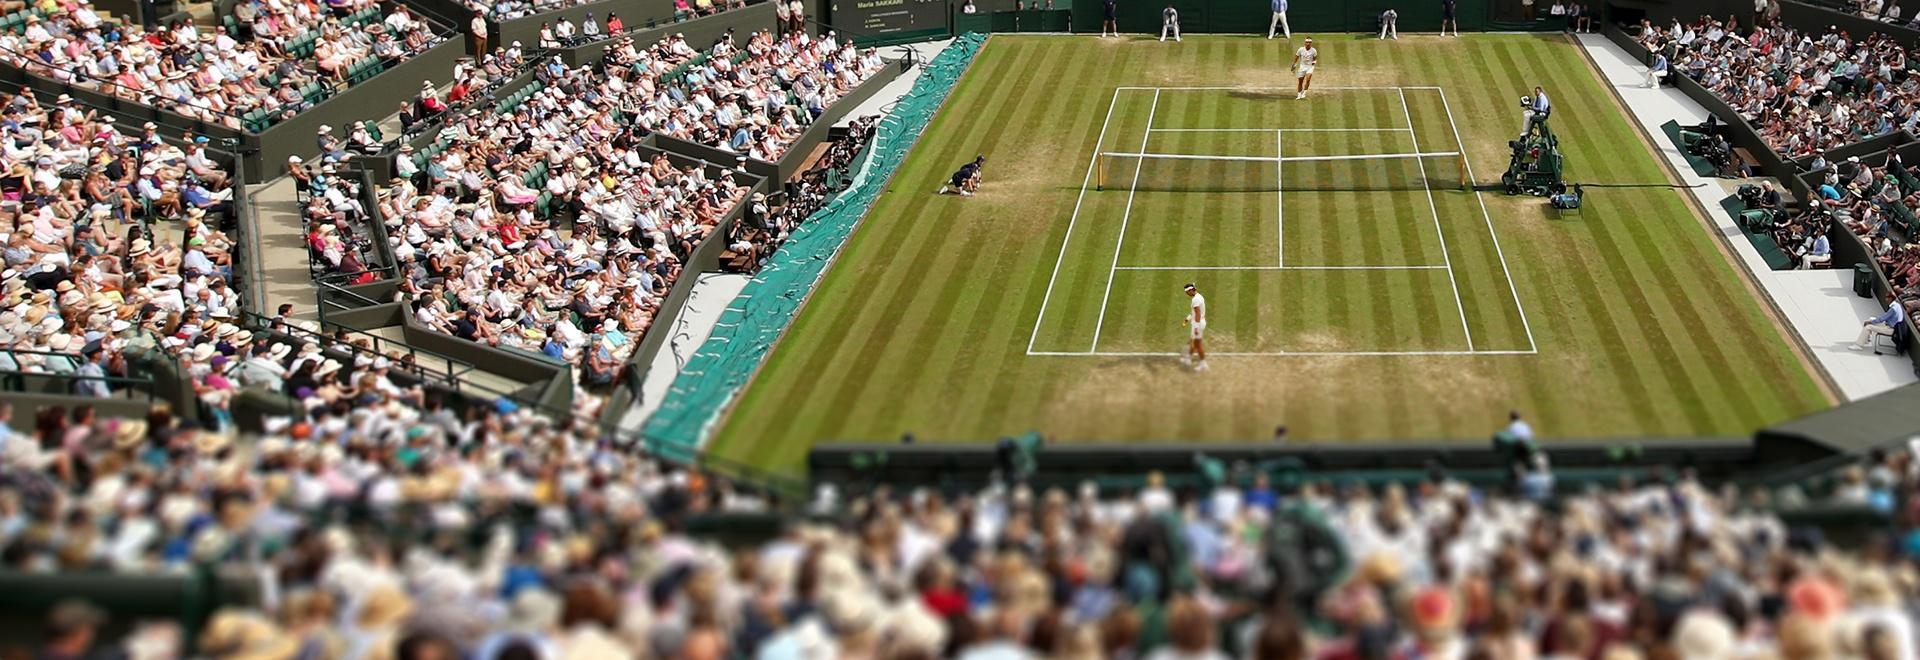 ATP Queen's 2019 - Stag. 2019 - Medvedev - Simon